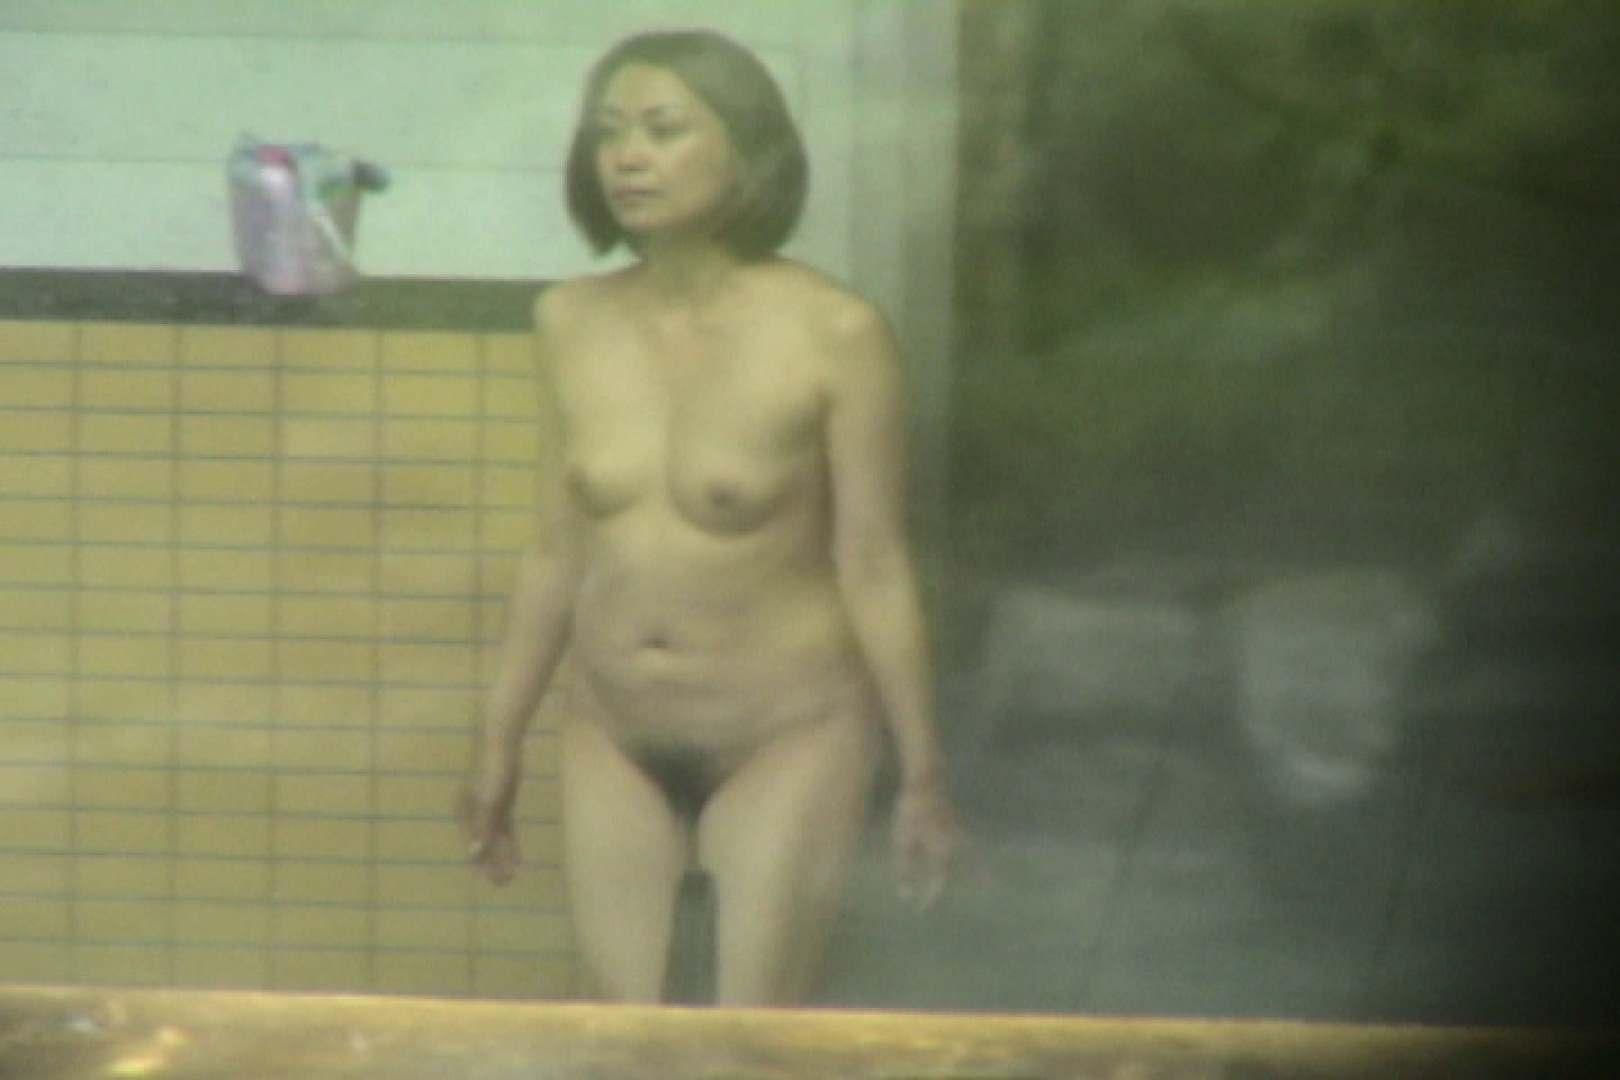 Aquaな露天風呂Vol.700 エッチな盗撮  90pic 66